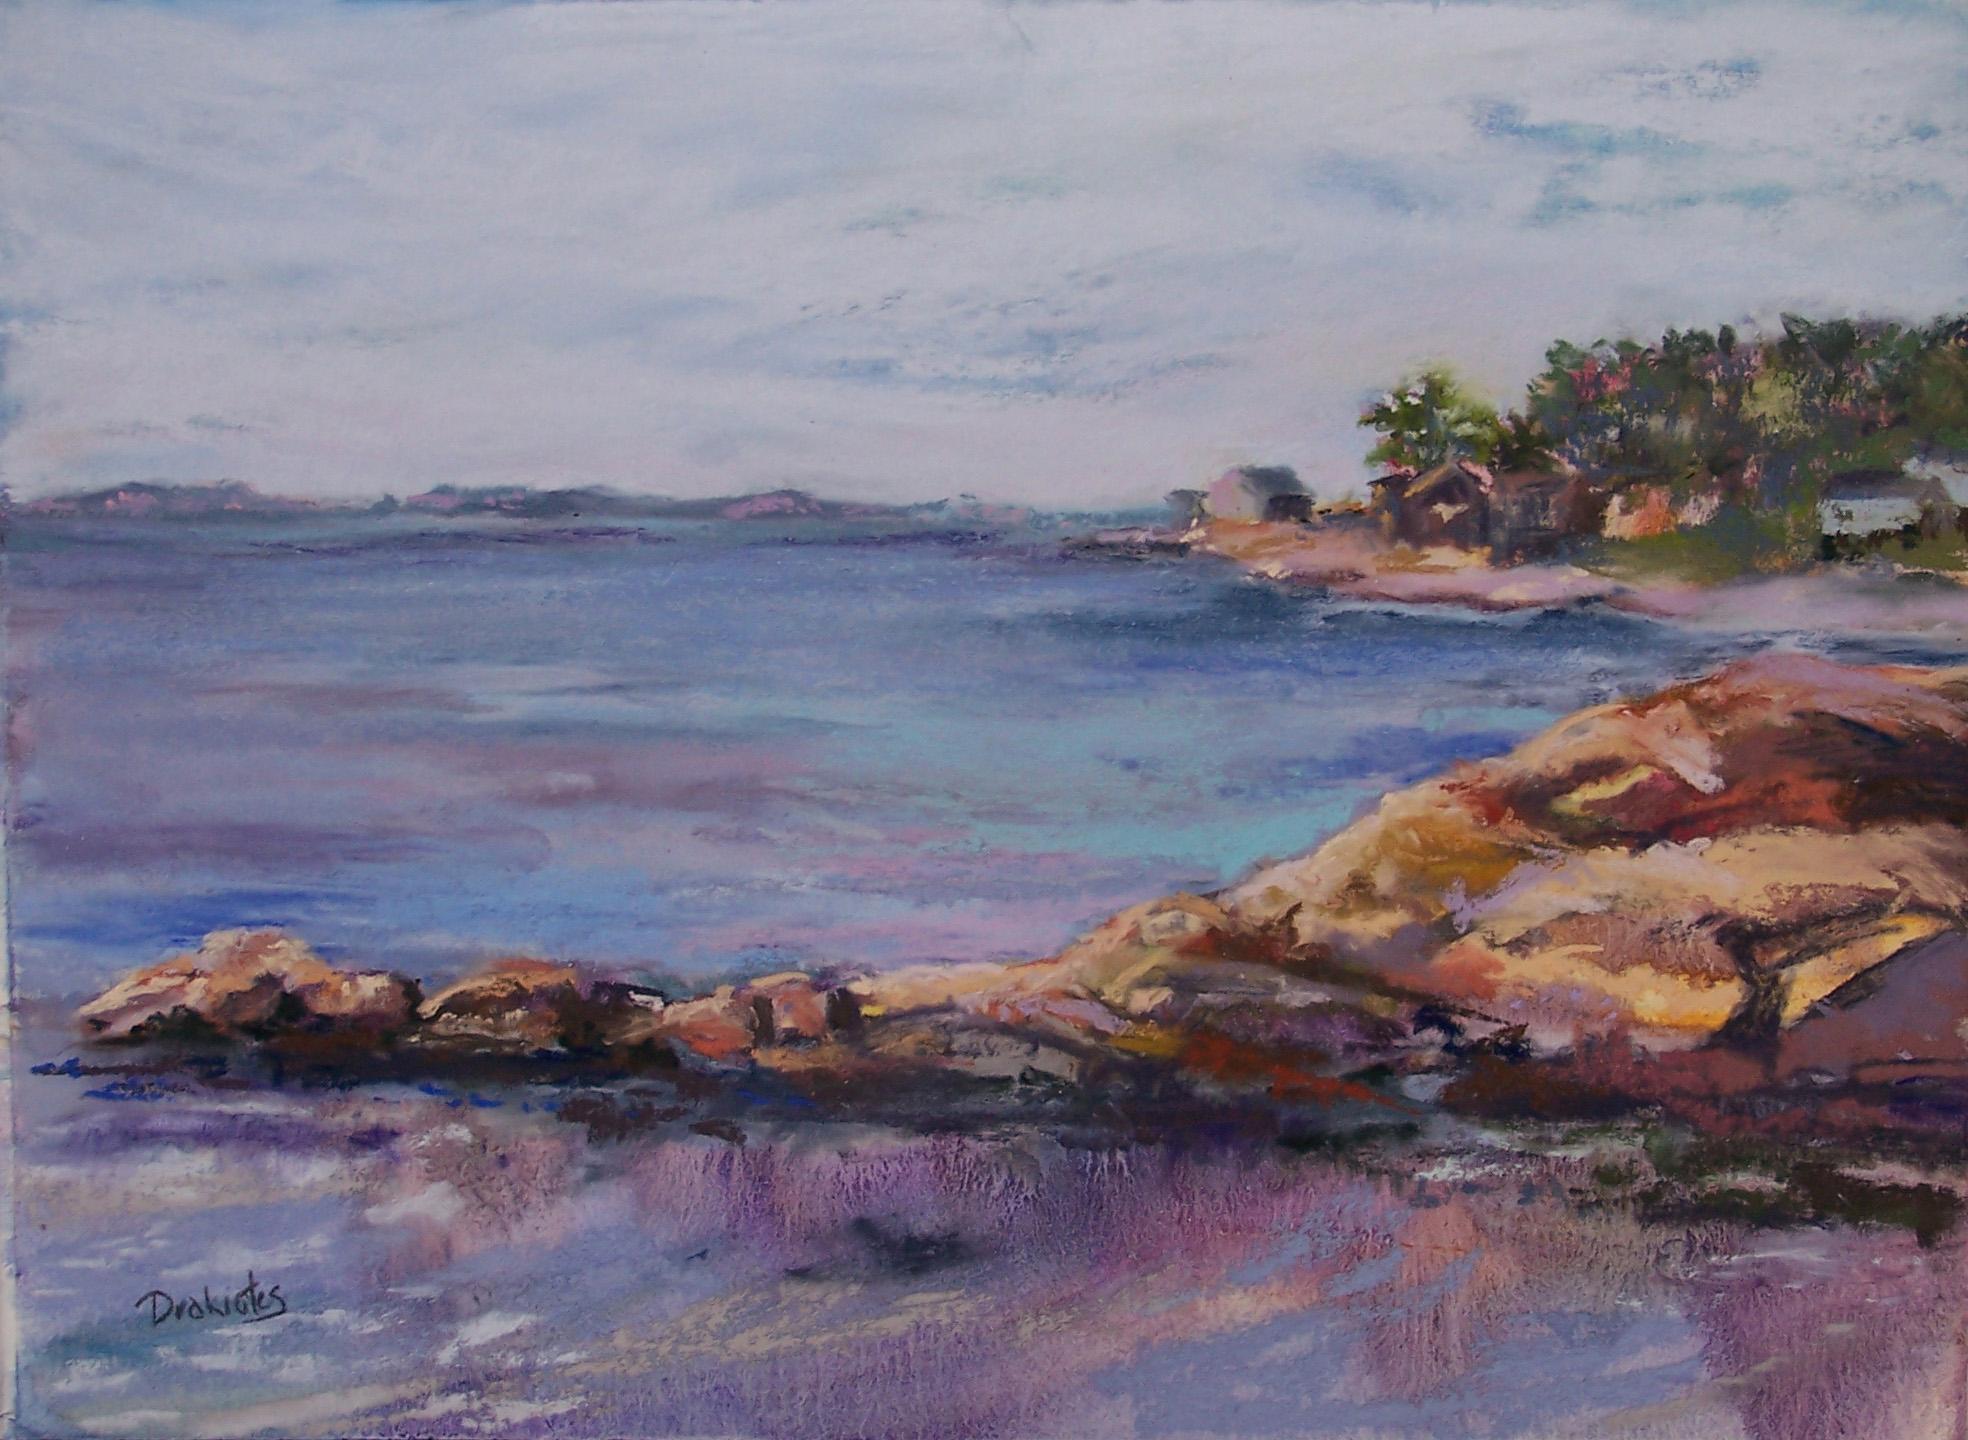 Alicia Drakiotes - Rocky Point Afternoon (plein air pastel)